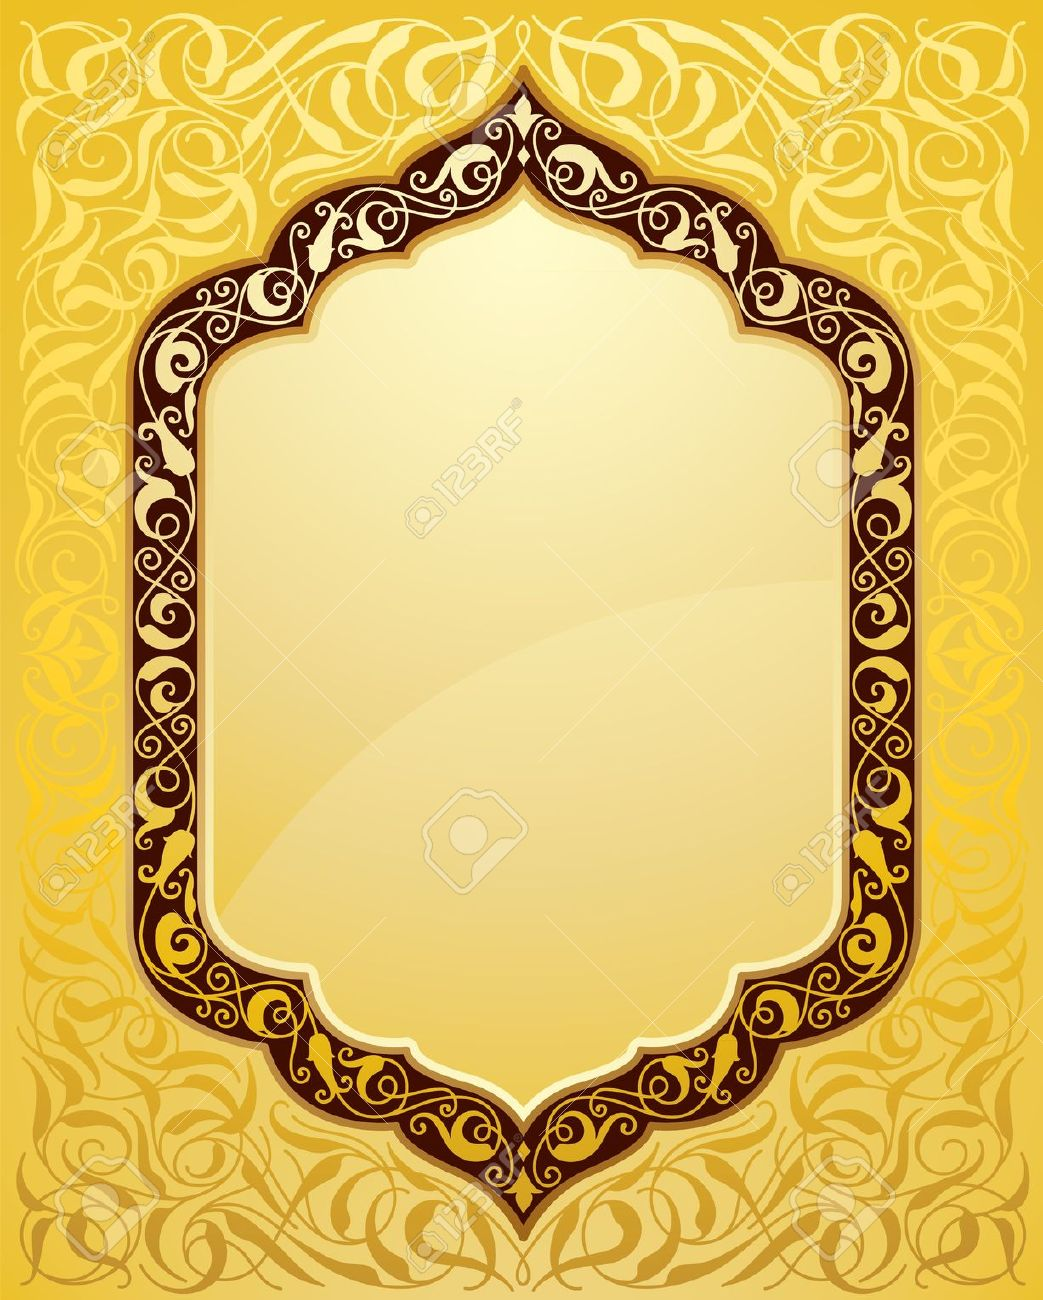 Islamic Backgrounds - Islamic Background Hd Portrait - 1043x1300 Wallpaper  - Teahub.io